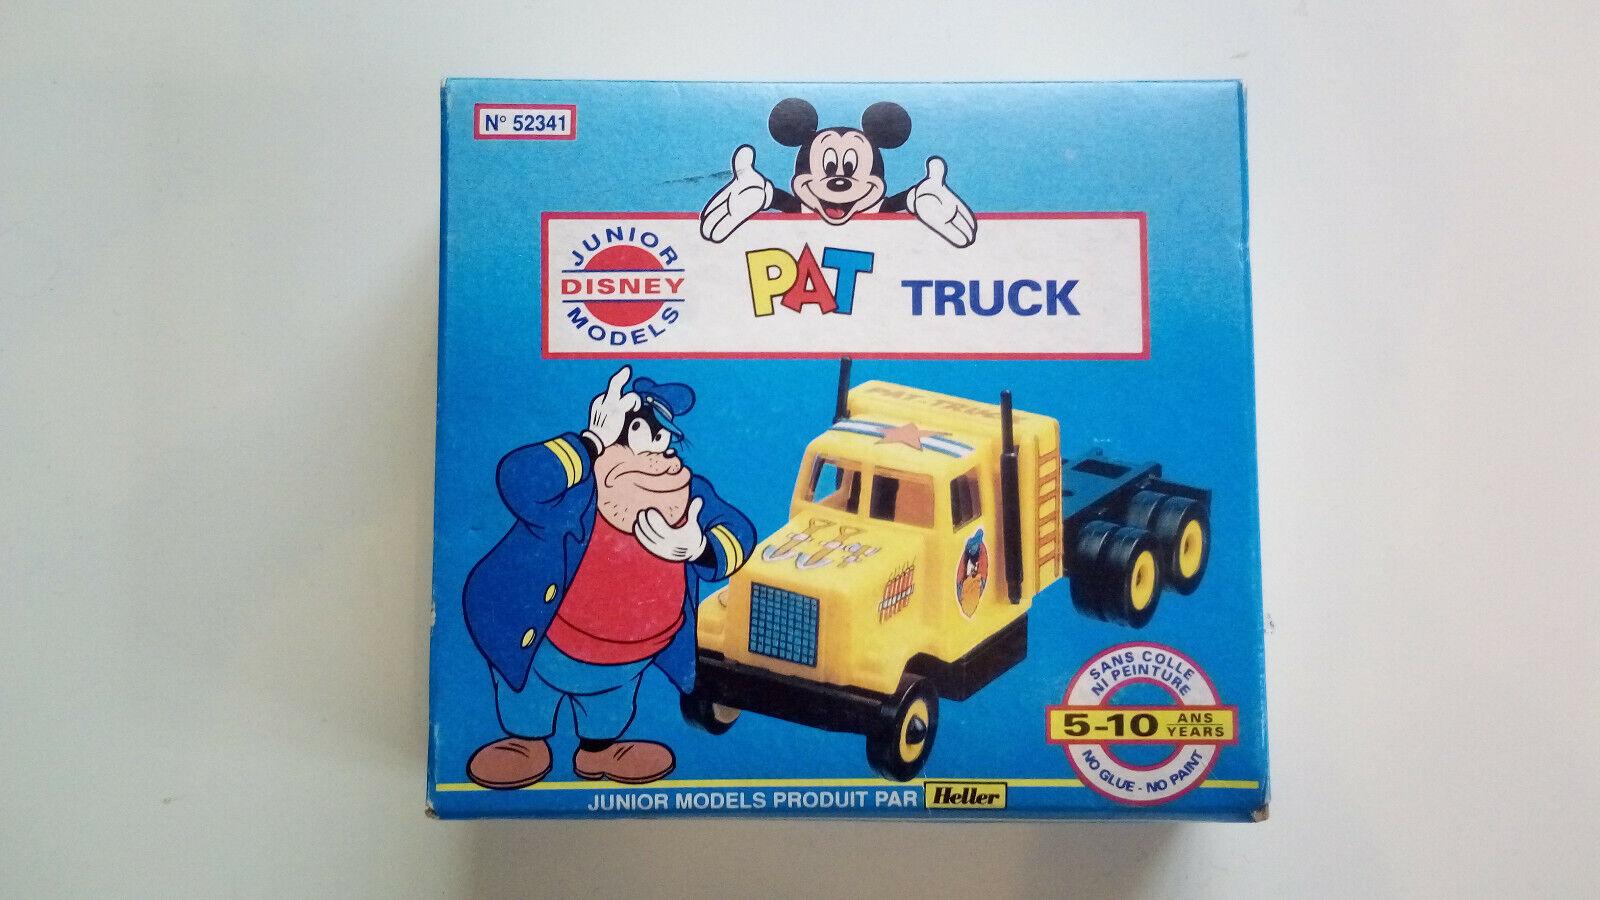 Vintage Junior Model Pat camion de HELLER no. 52341  new & neuf dans sa boîte